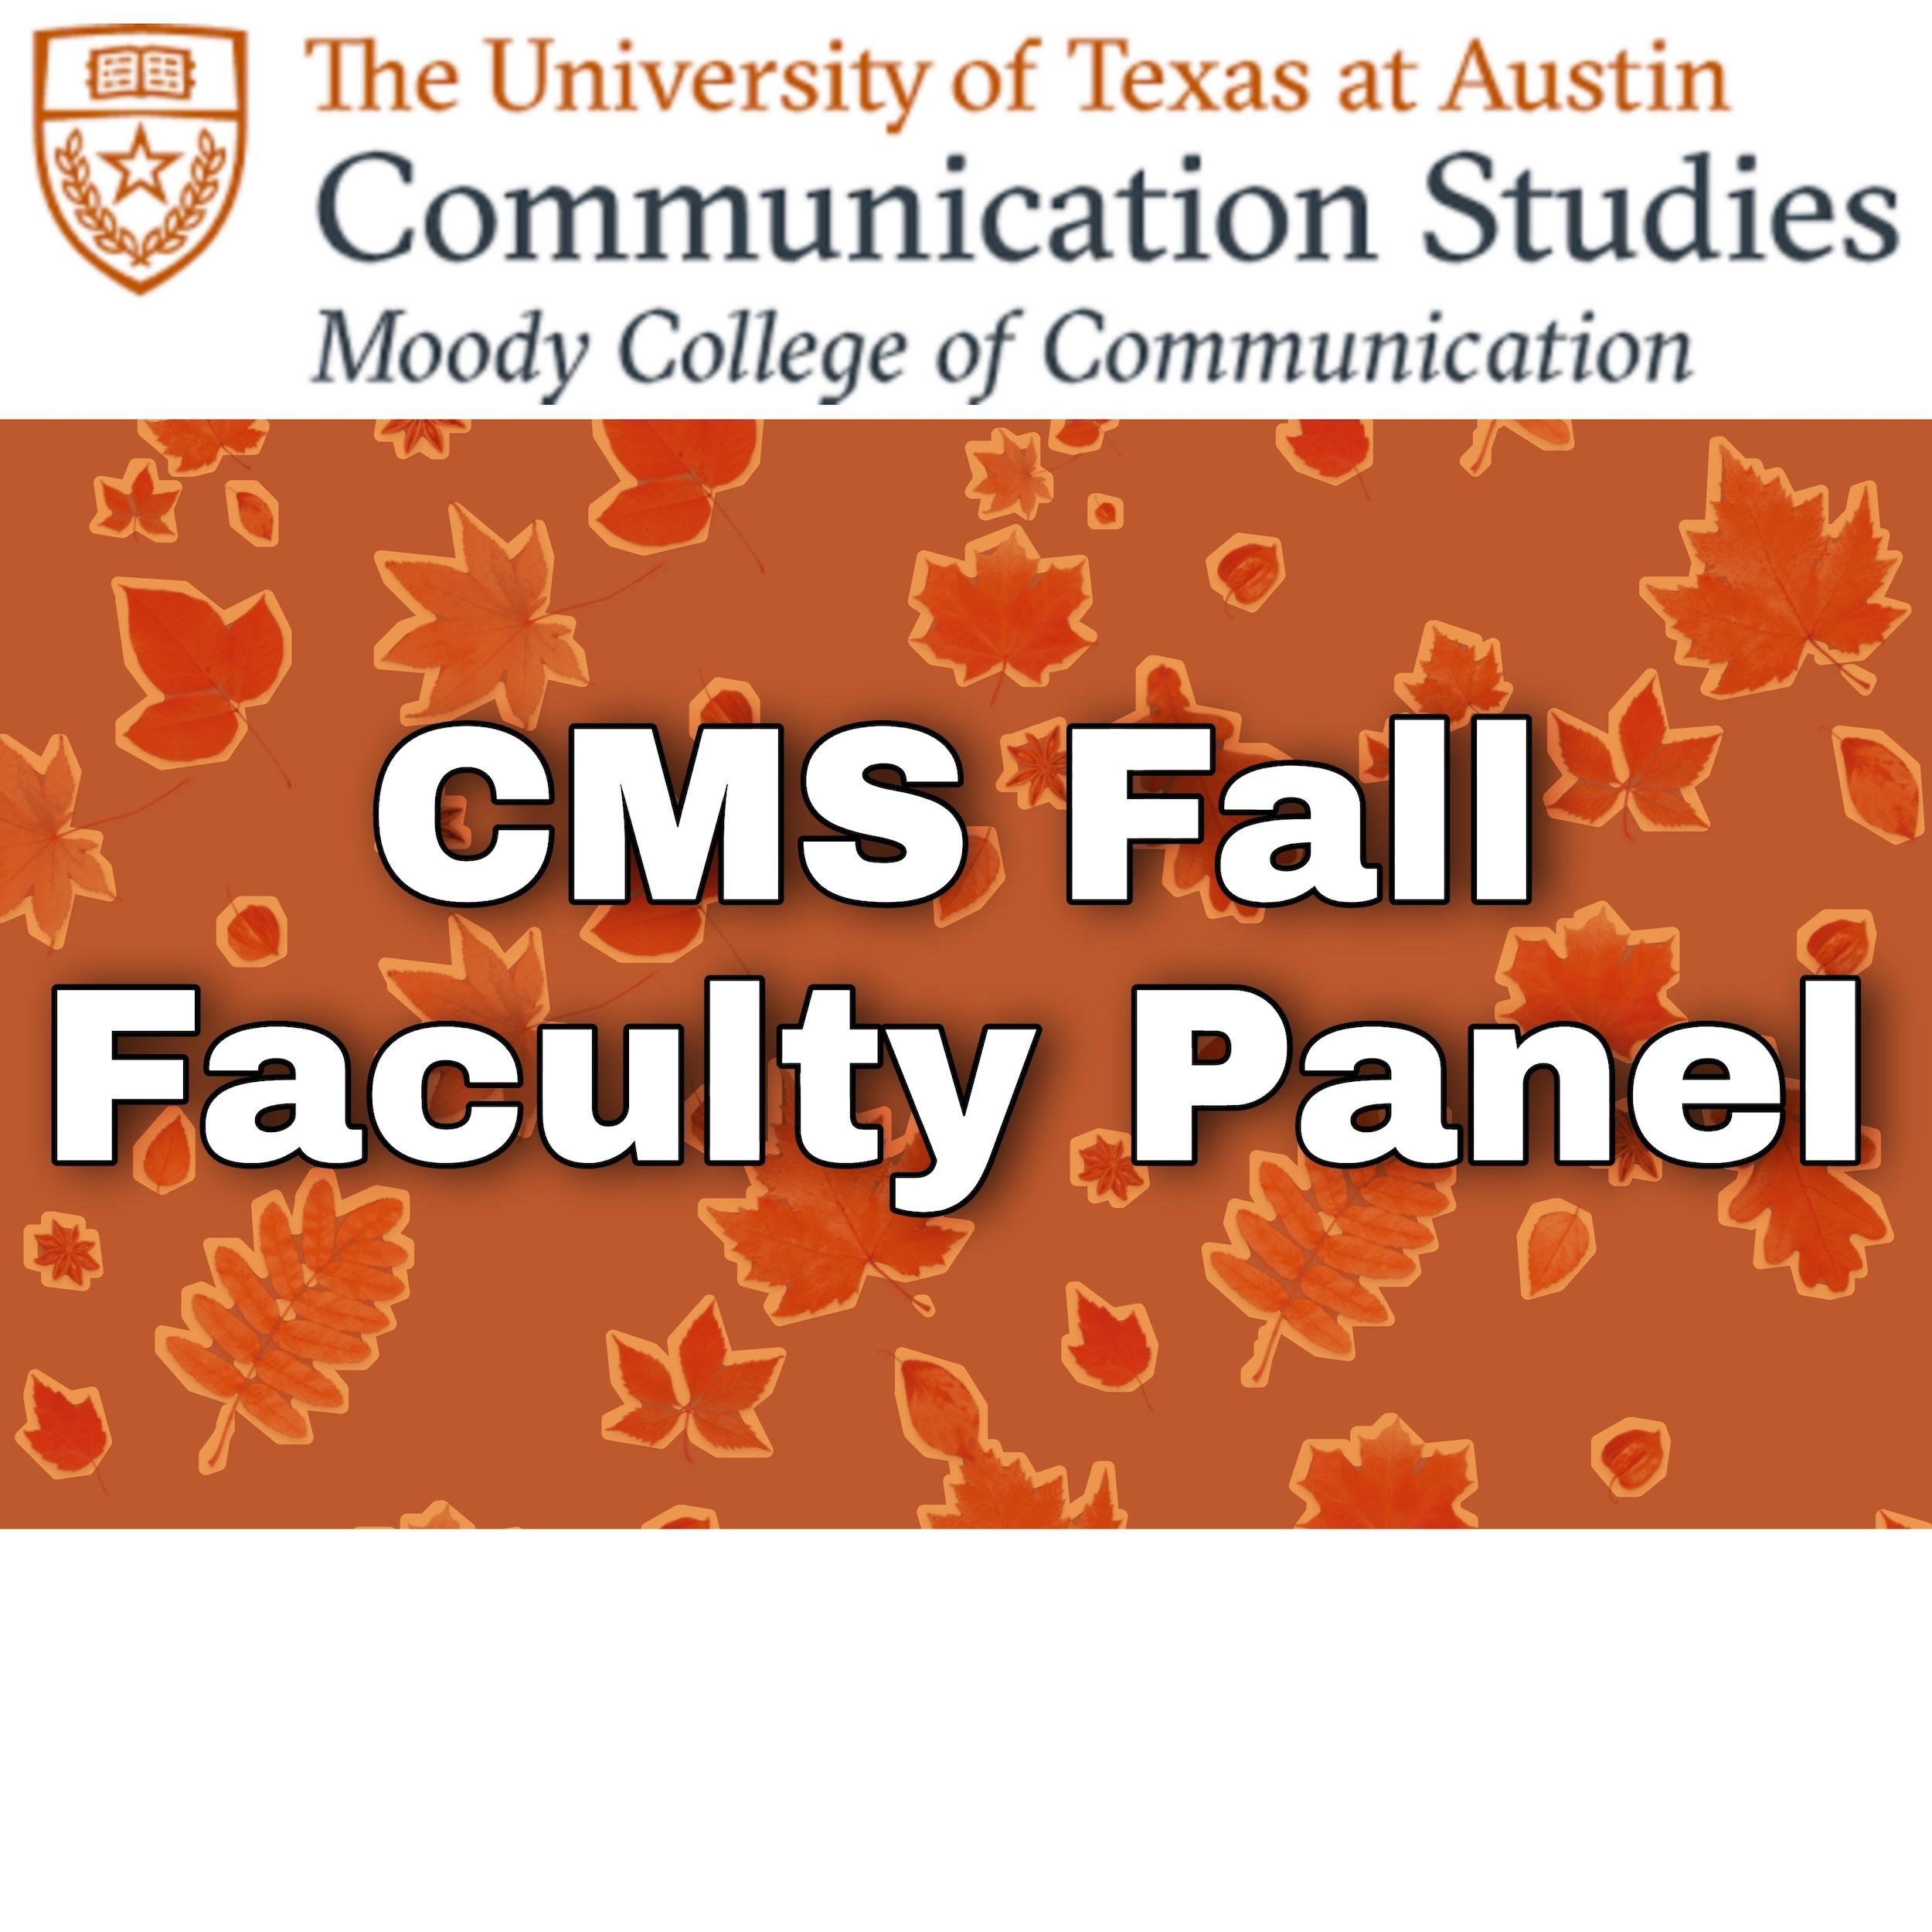 CMS_Fall_Faculty_Panel